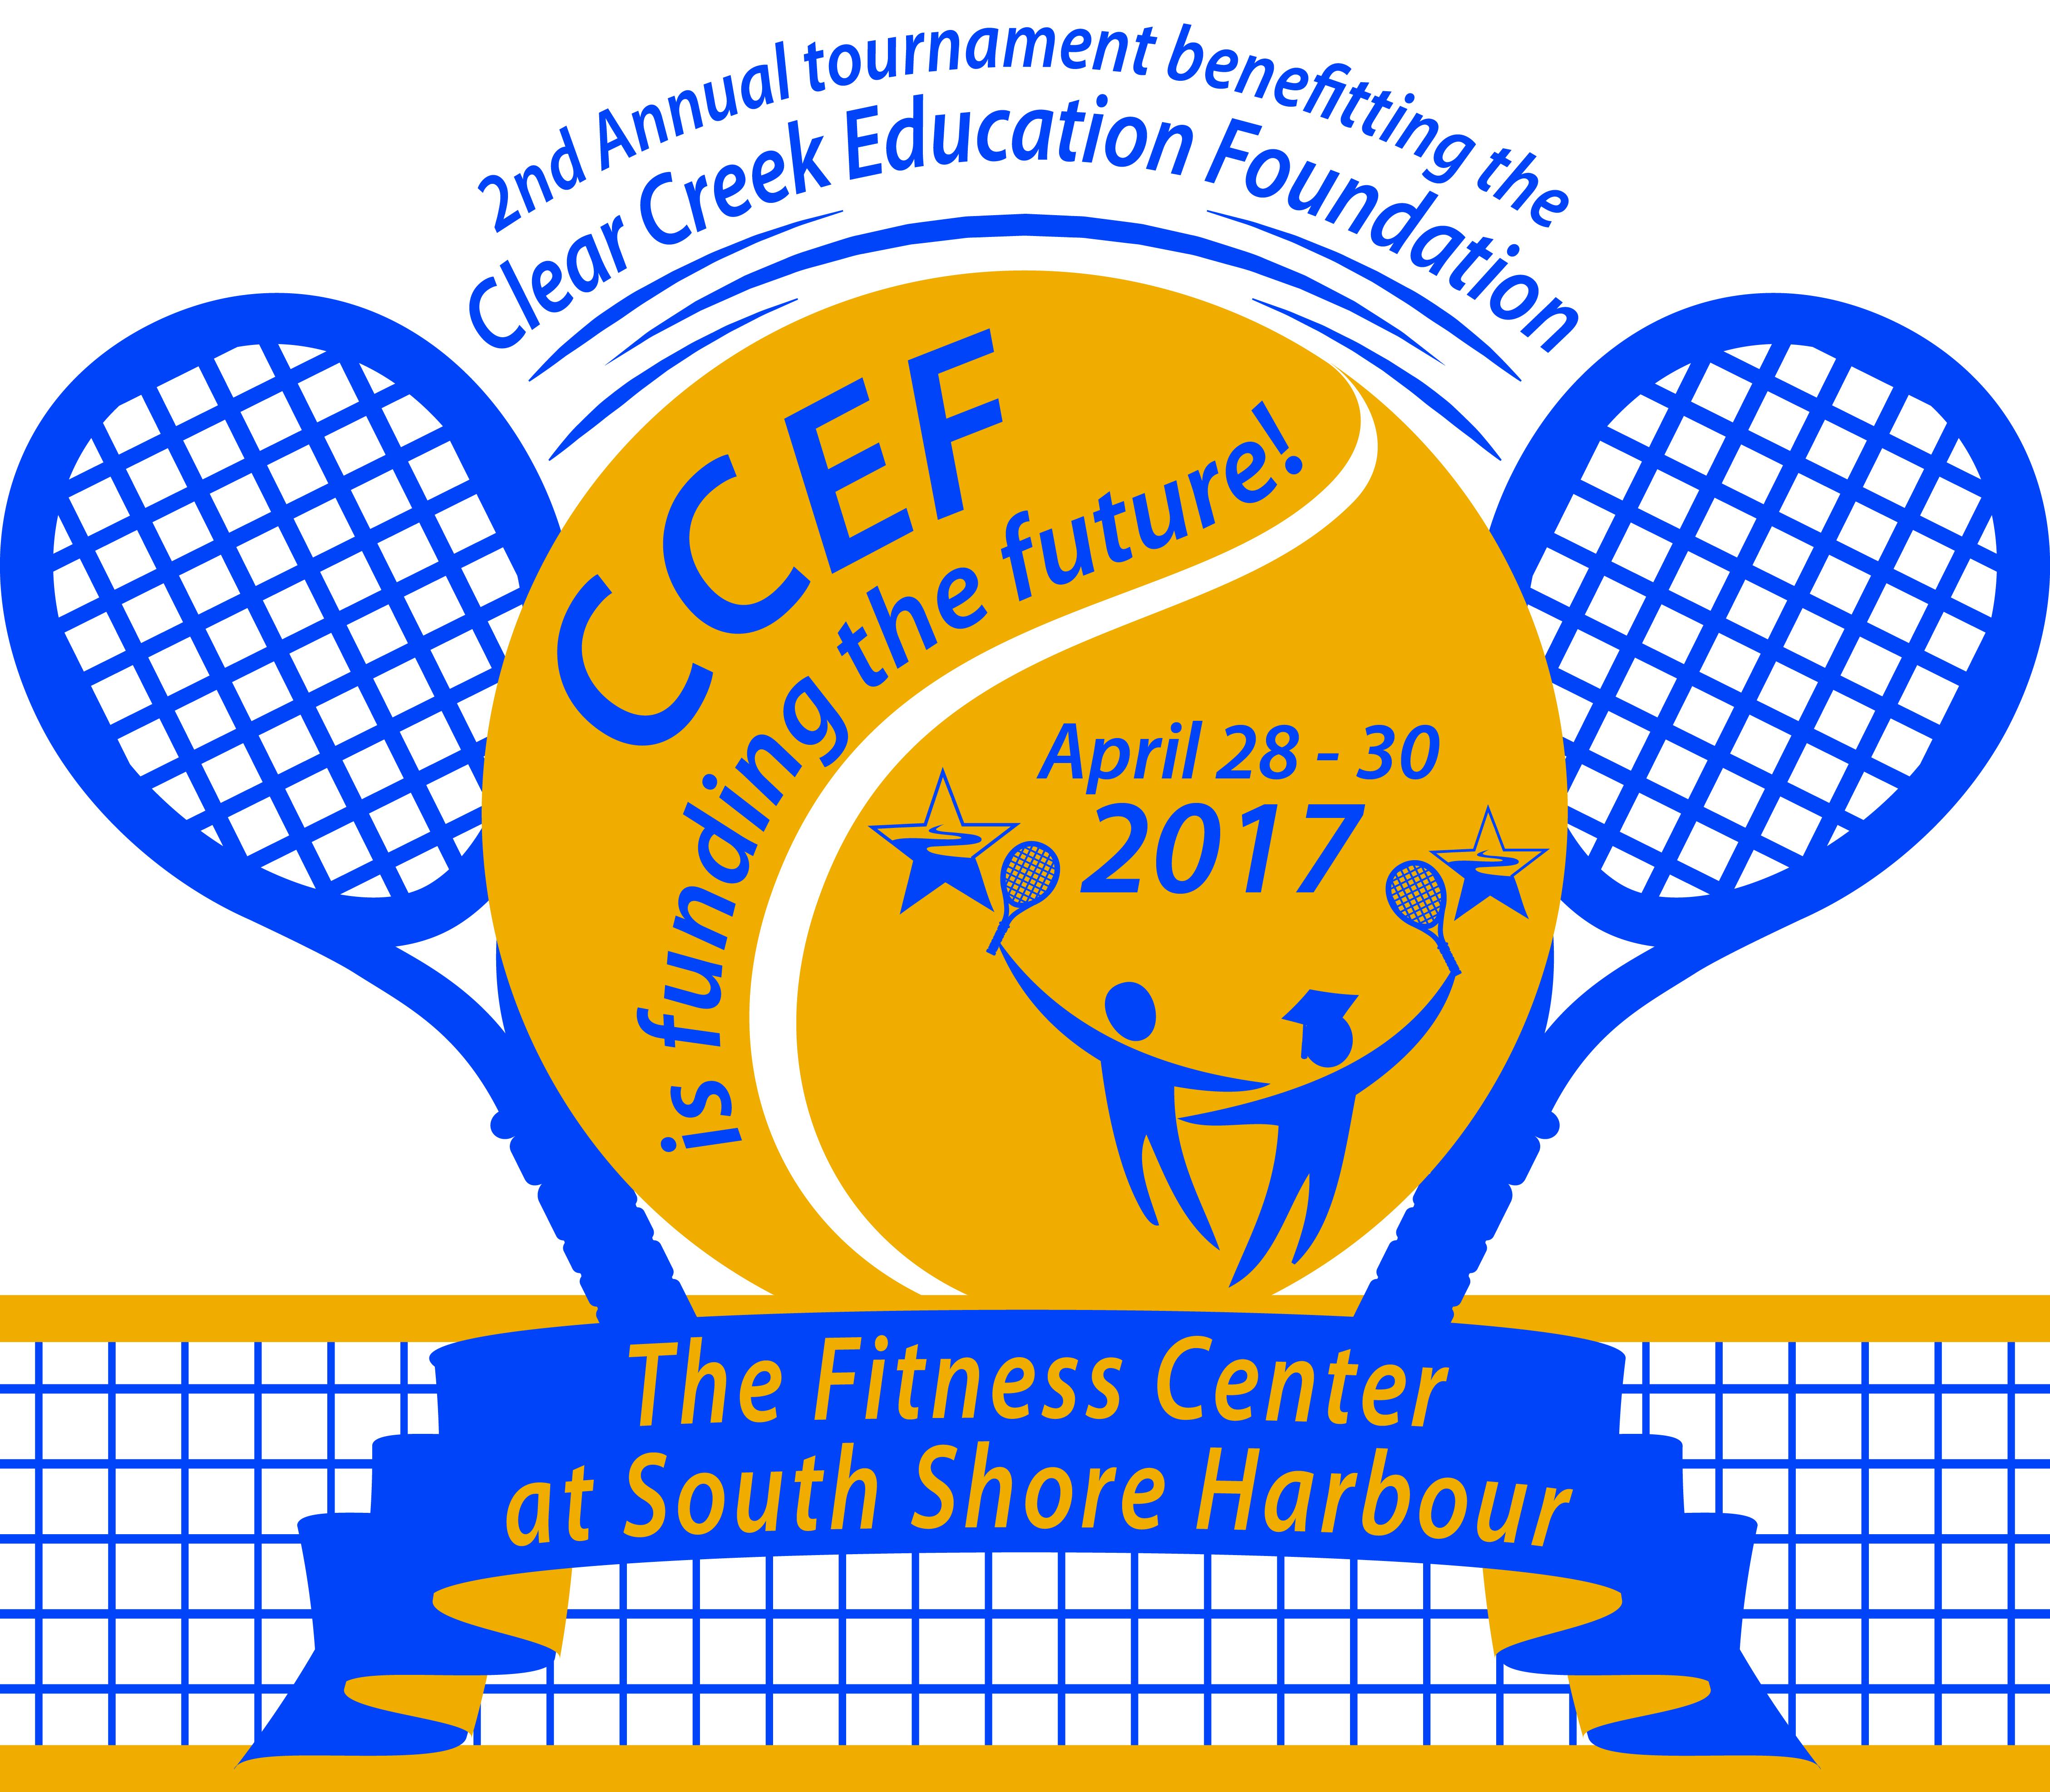 CCEF_2ndAnnualTennisTournament2017